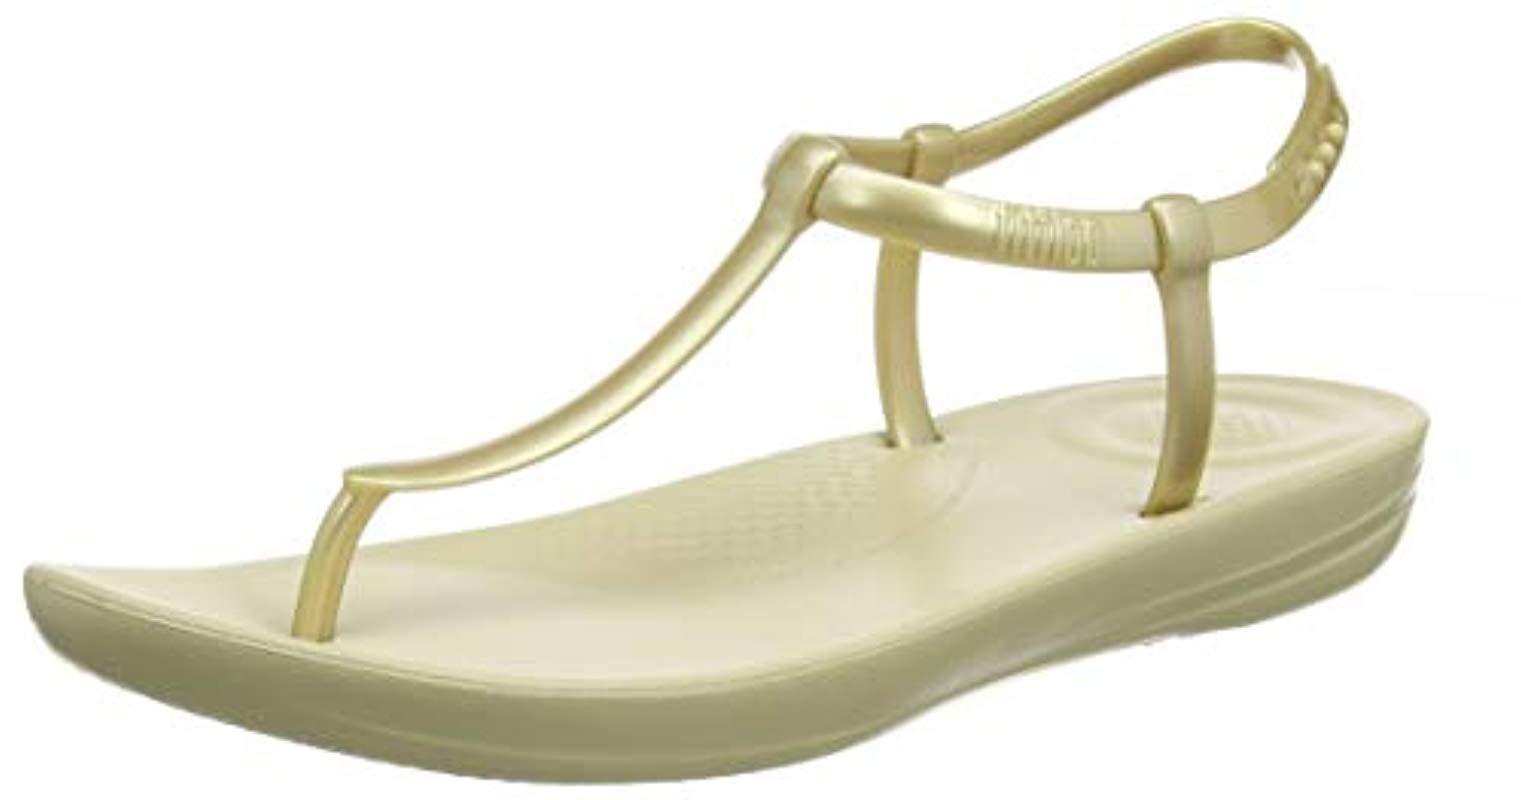 42fa5b9cdcdd Fitflop Iqushion Splash-pearlised Flip Flops in Metallic - Lyst